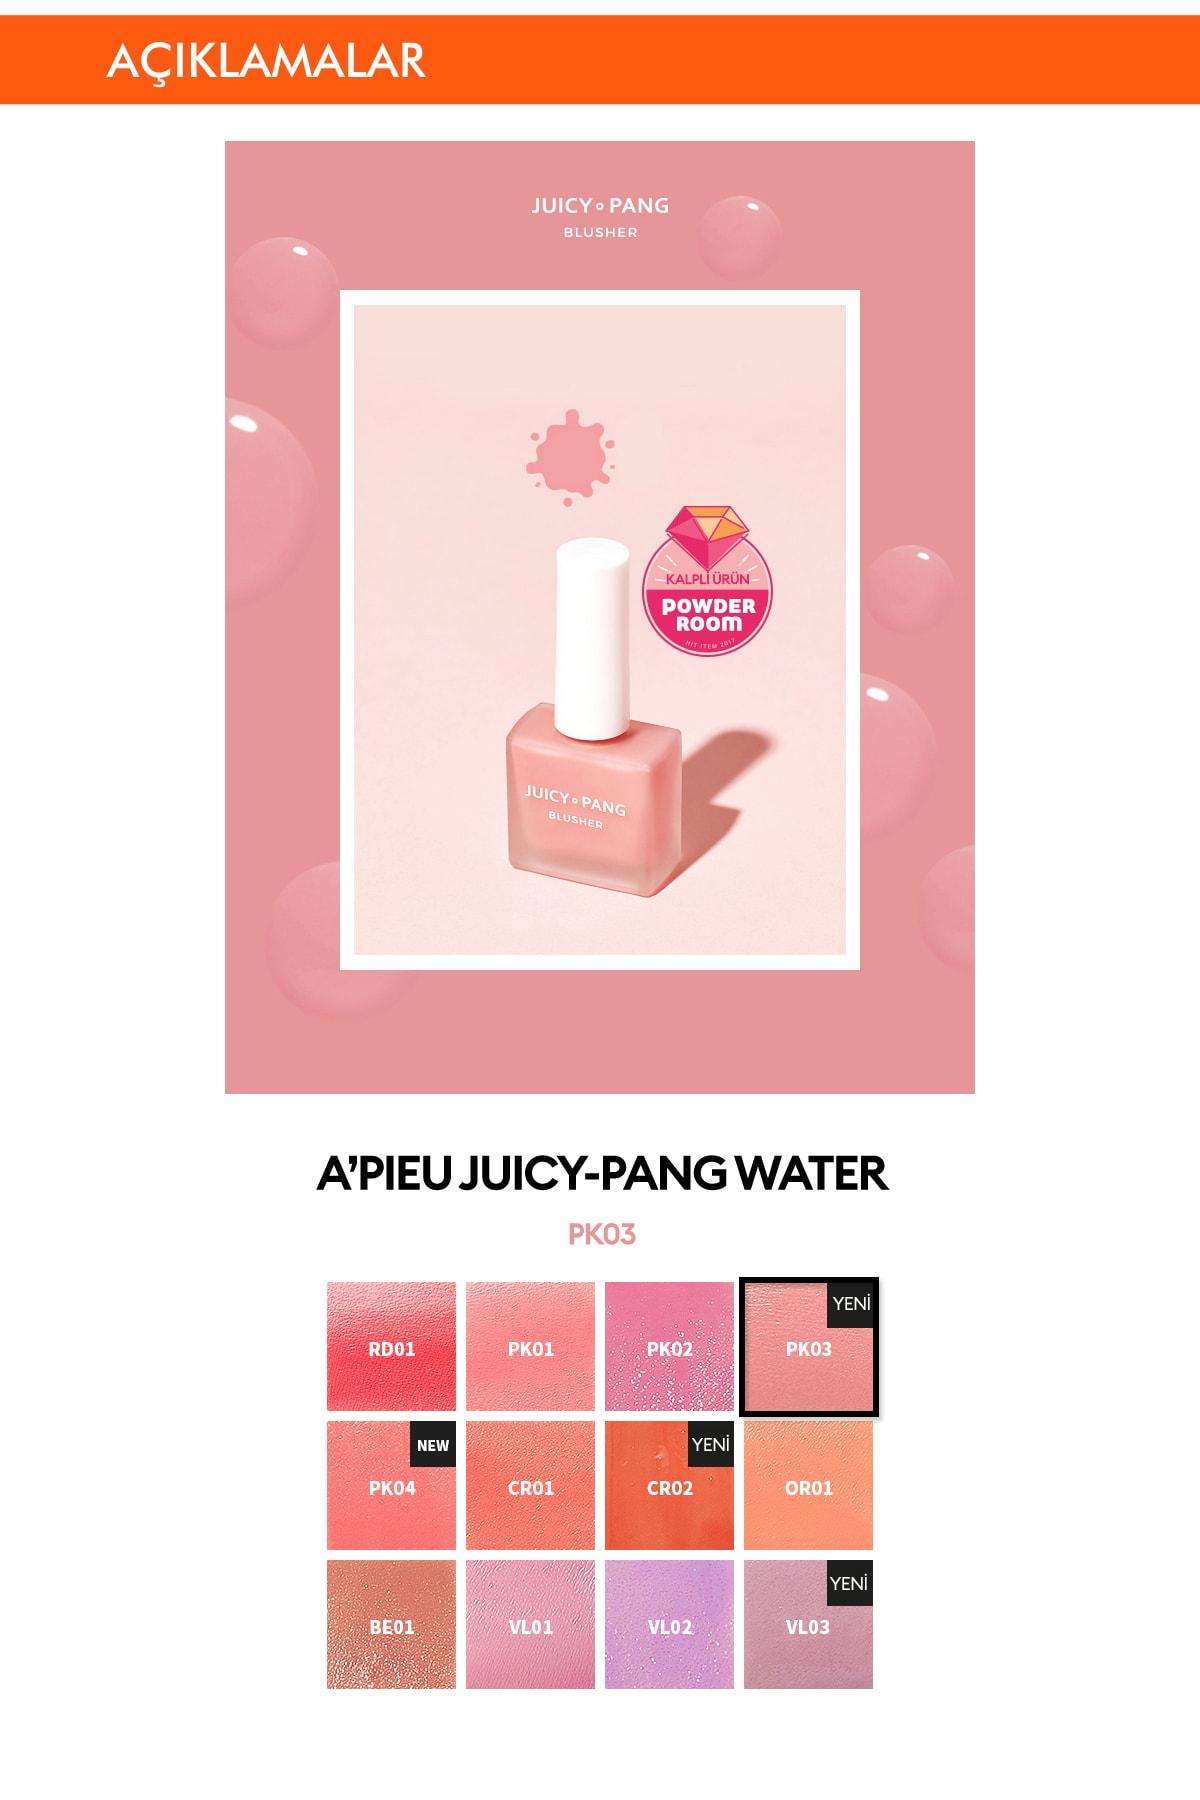 Missha Doğal Görünüm Sunan Nemlendirici Likit Allık 9g. APIEU Juicy-Pang Water Blusher (PK03) 1